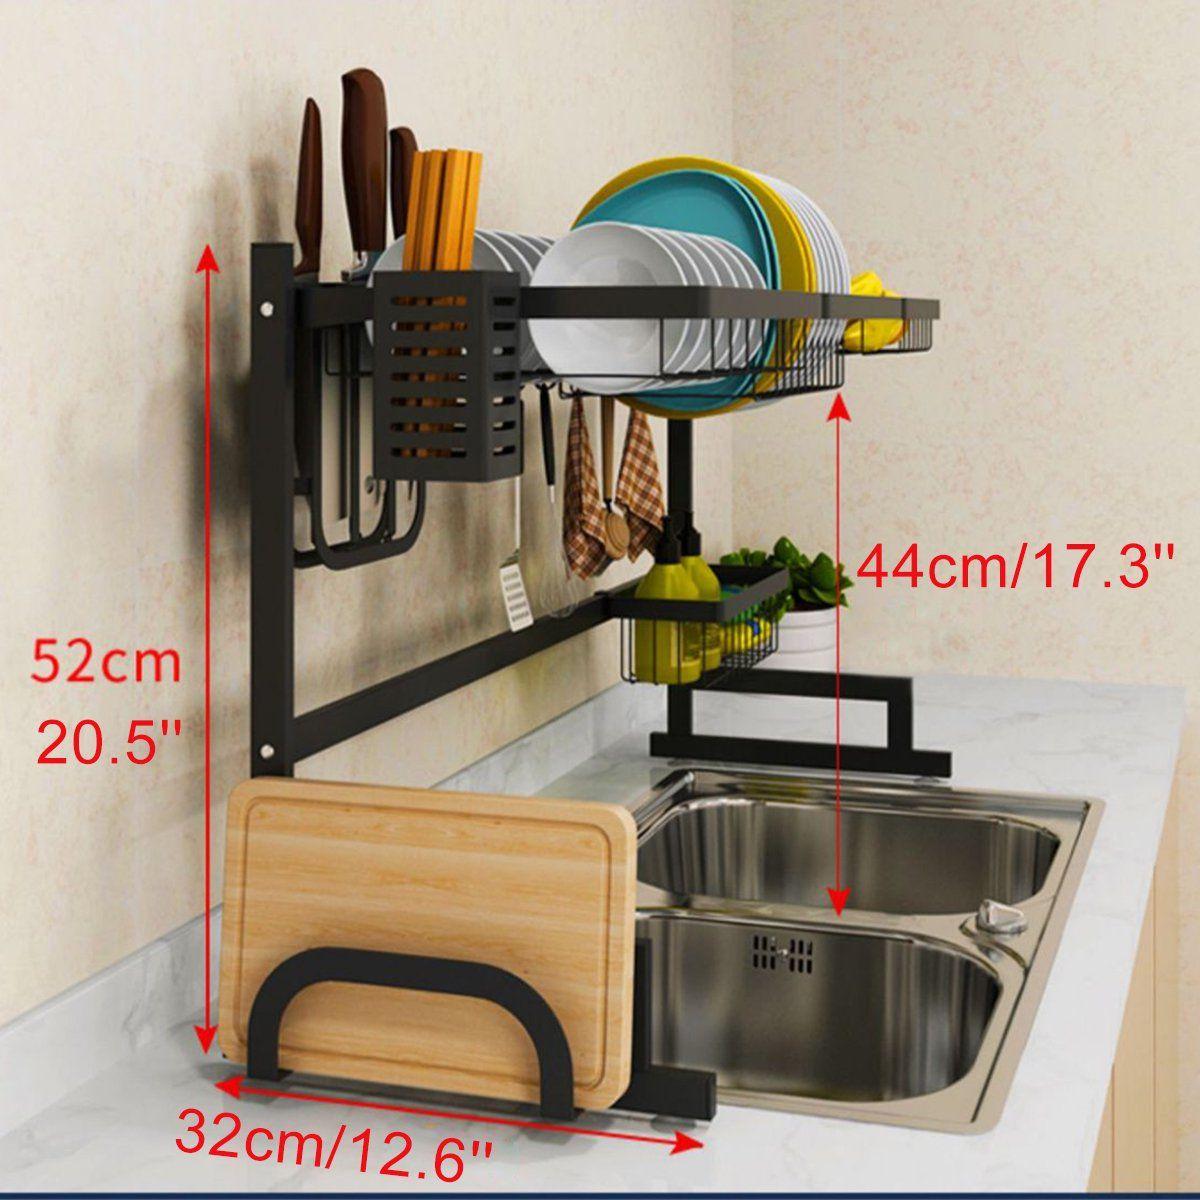 how to measure kitchen sink strainer basket